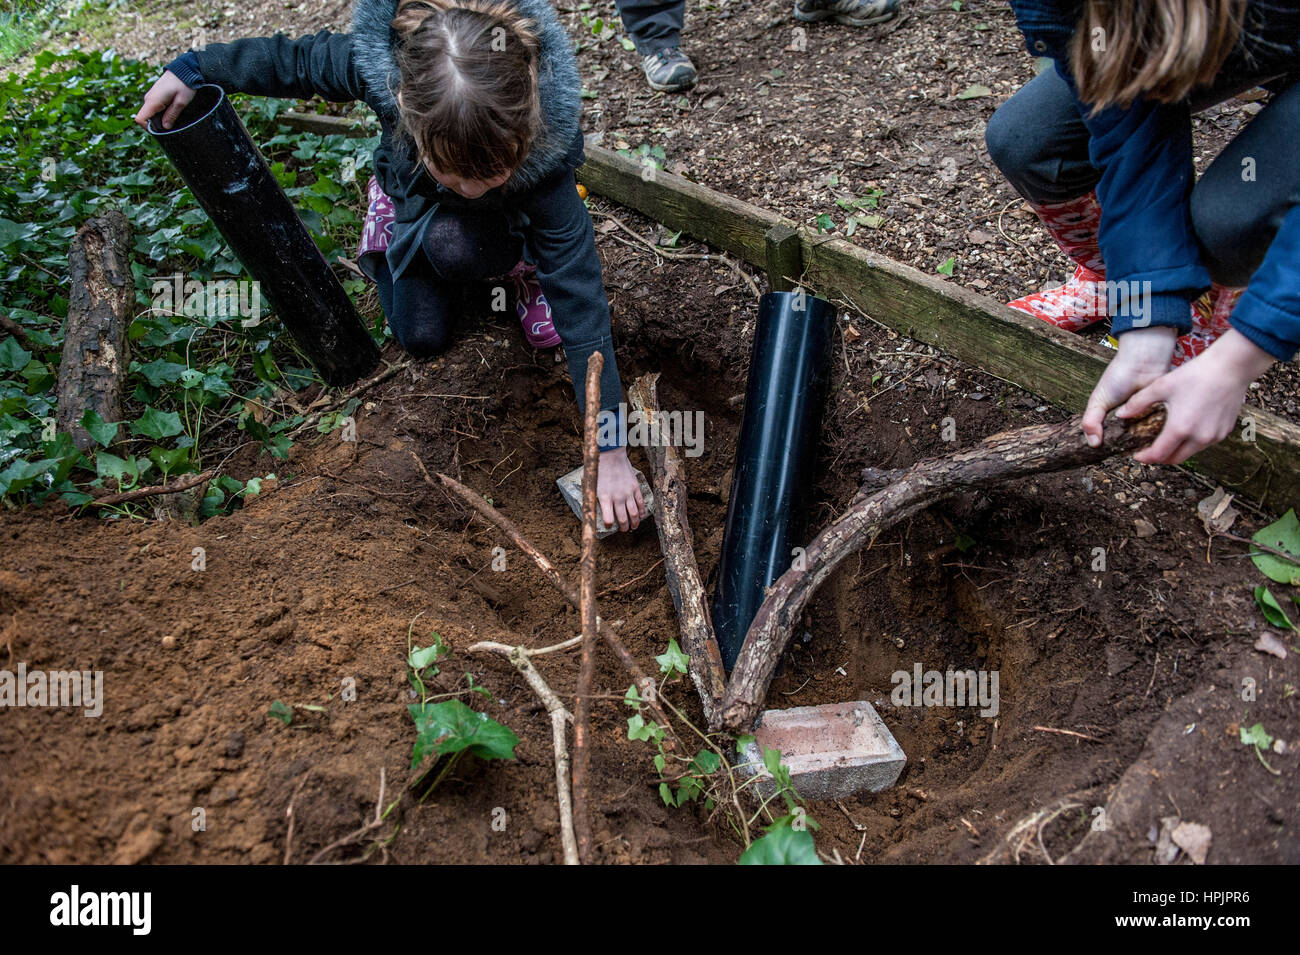 abode Stockfotos & abode Bilder - Alamy